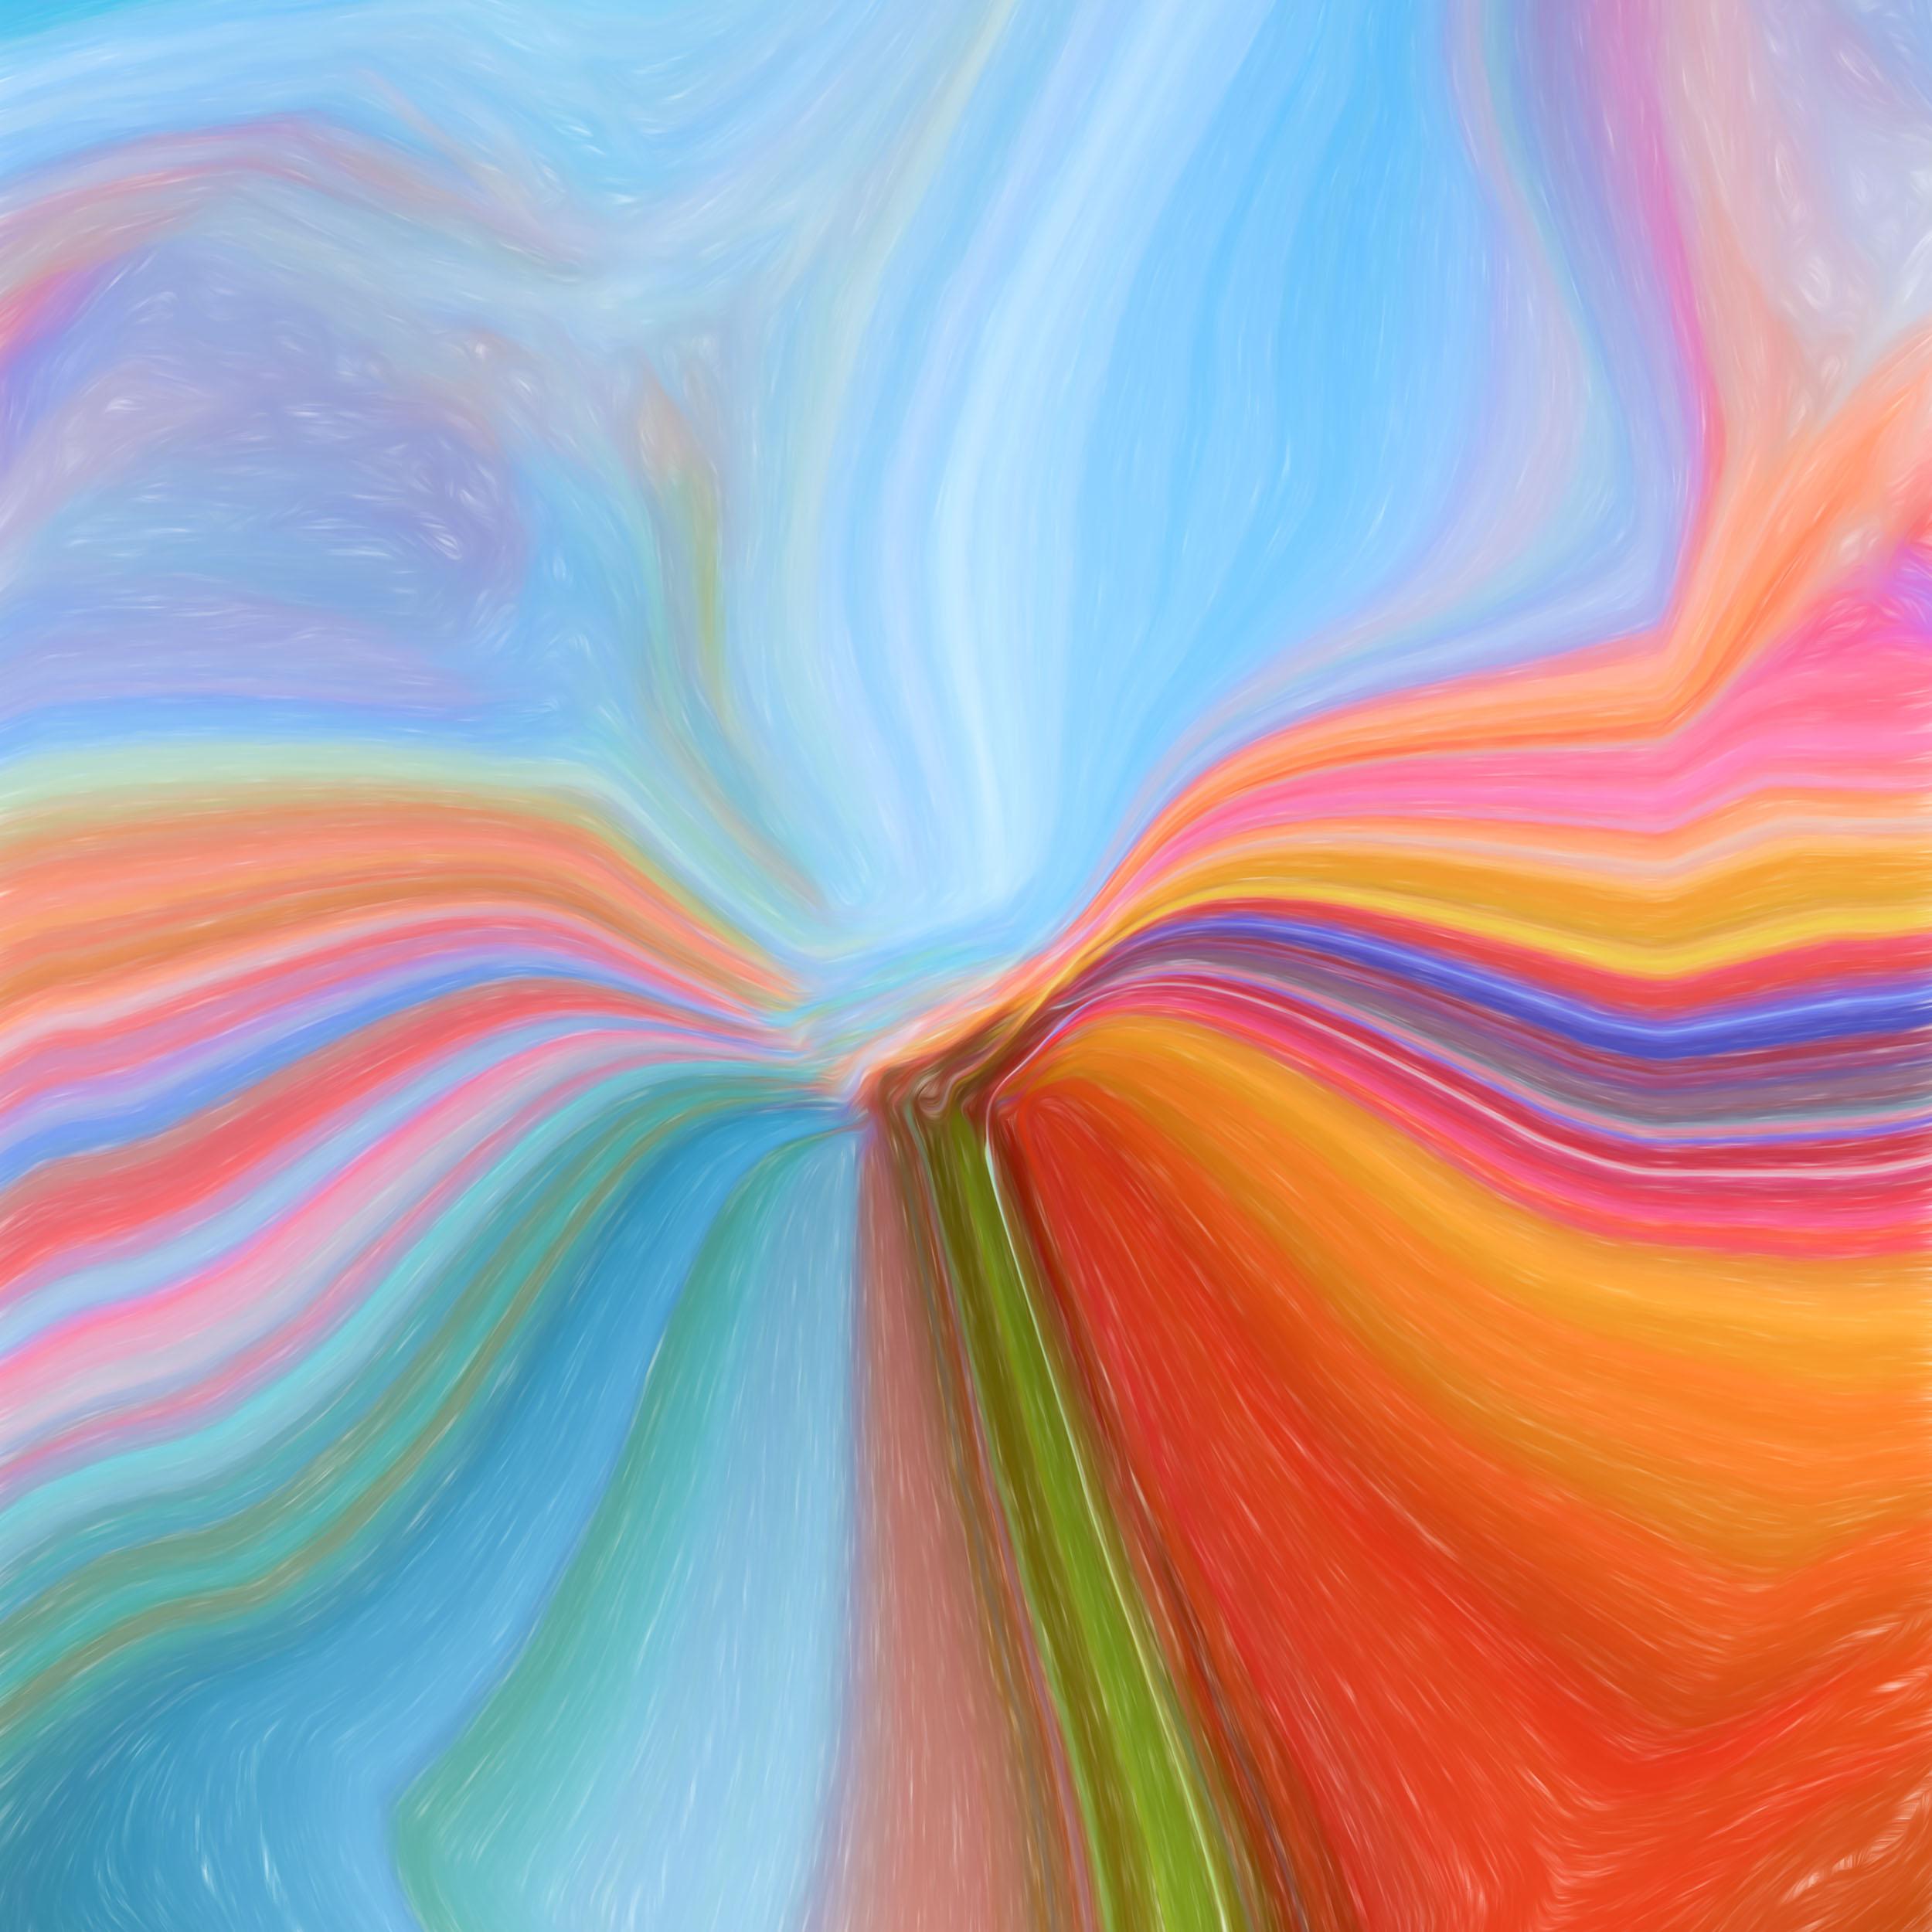 """Sunlight Flower Squared"" - Photography Artist Kevin Sibbitt"